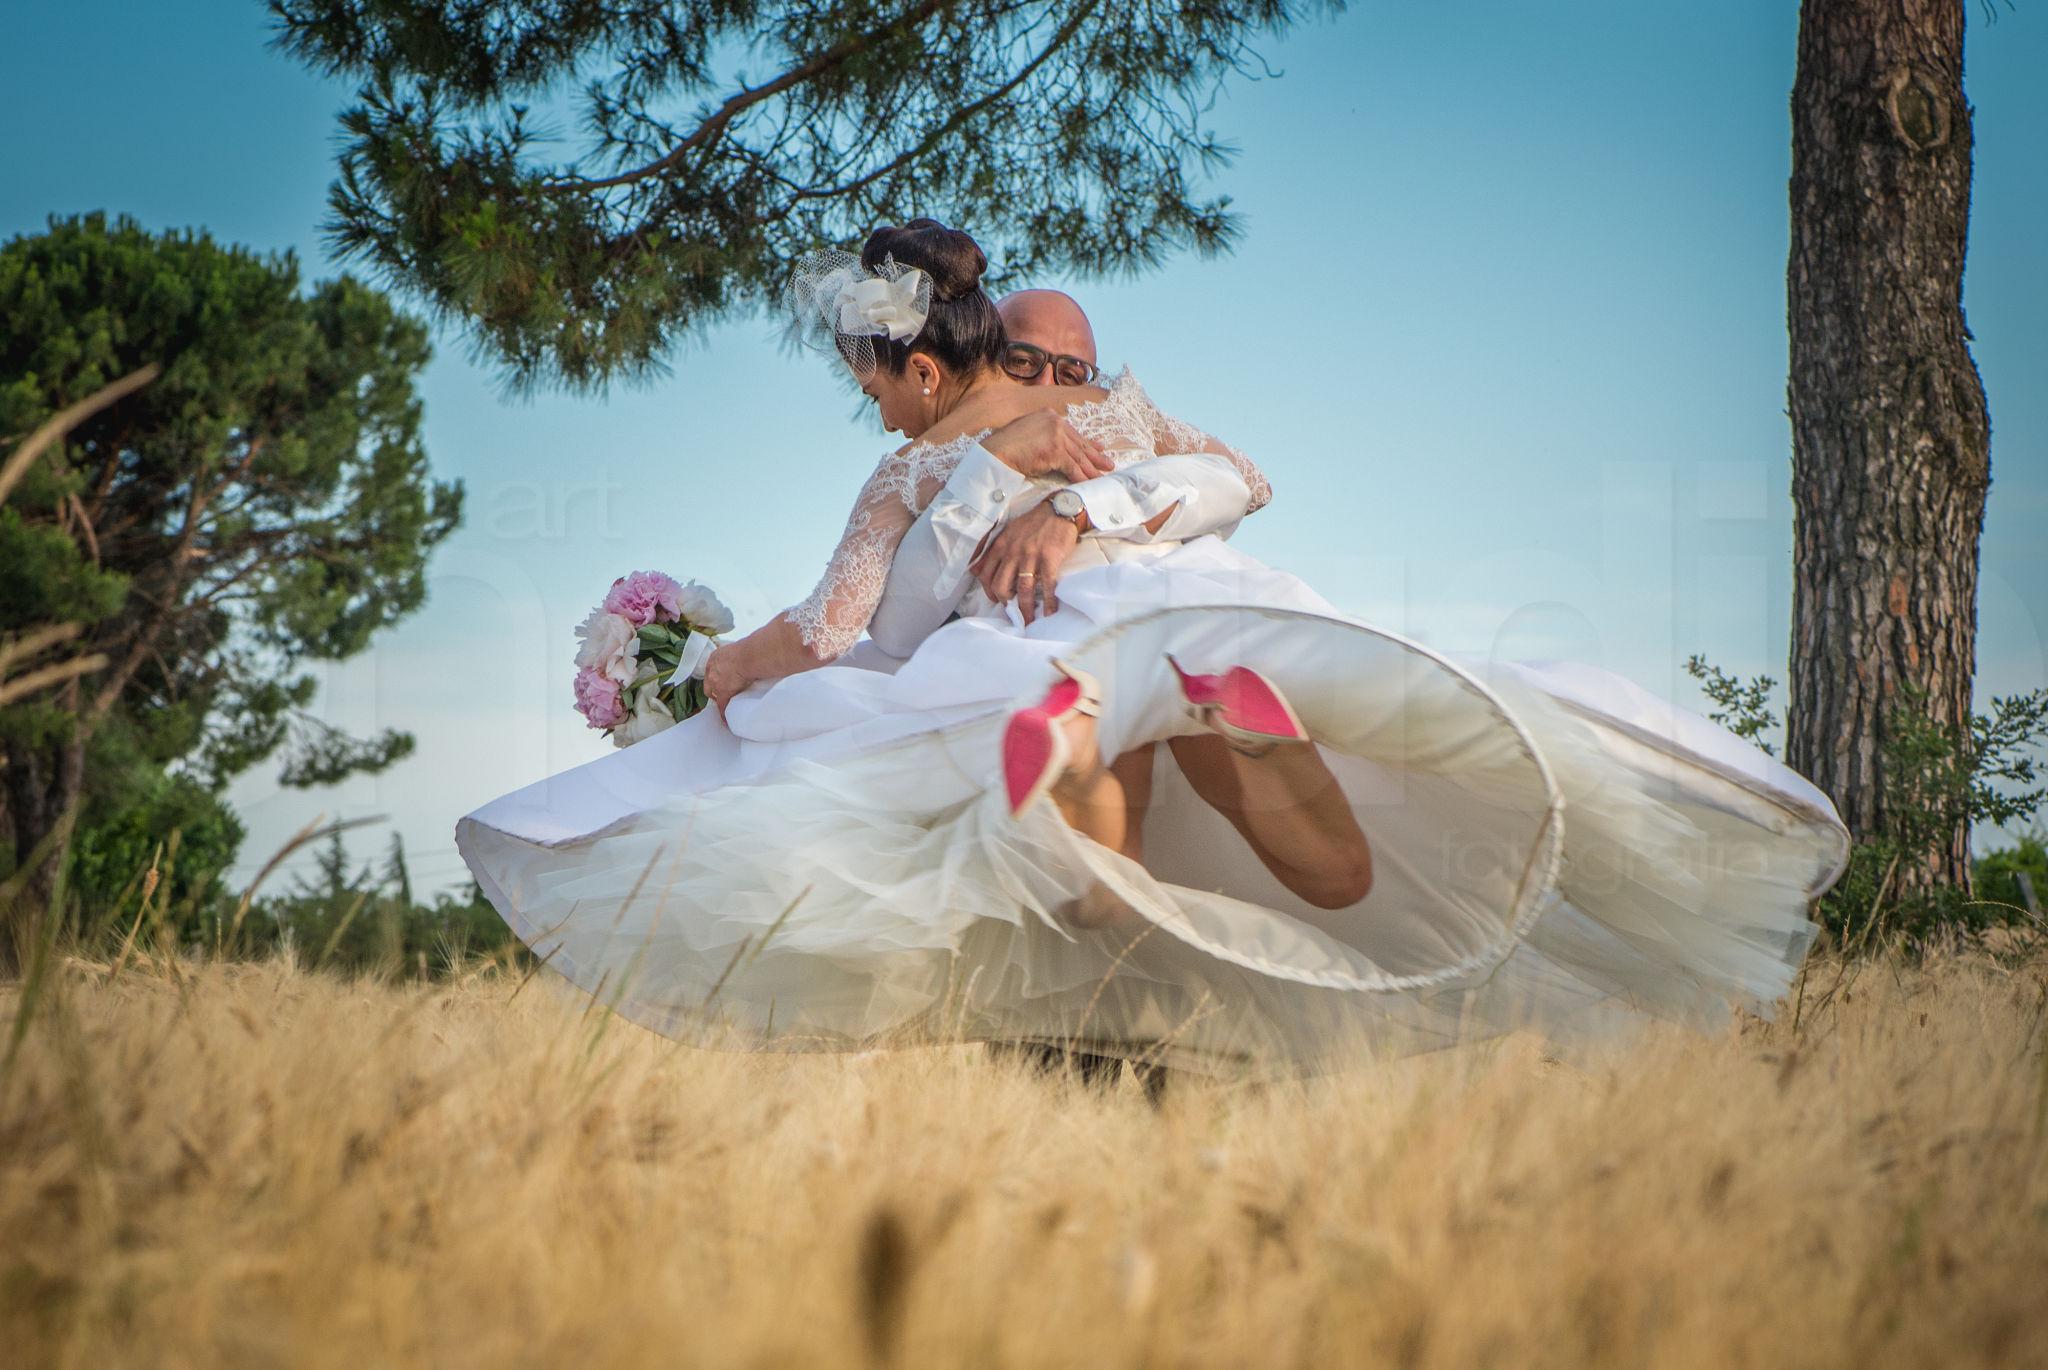 http://lnx.mirkone.it/wp-content/uploads/2015/07/fotografo-matrimoni-faenza-0008.jpg